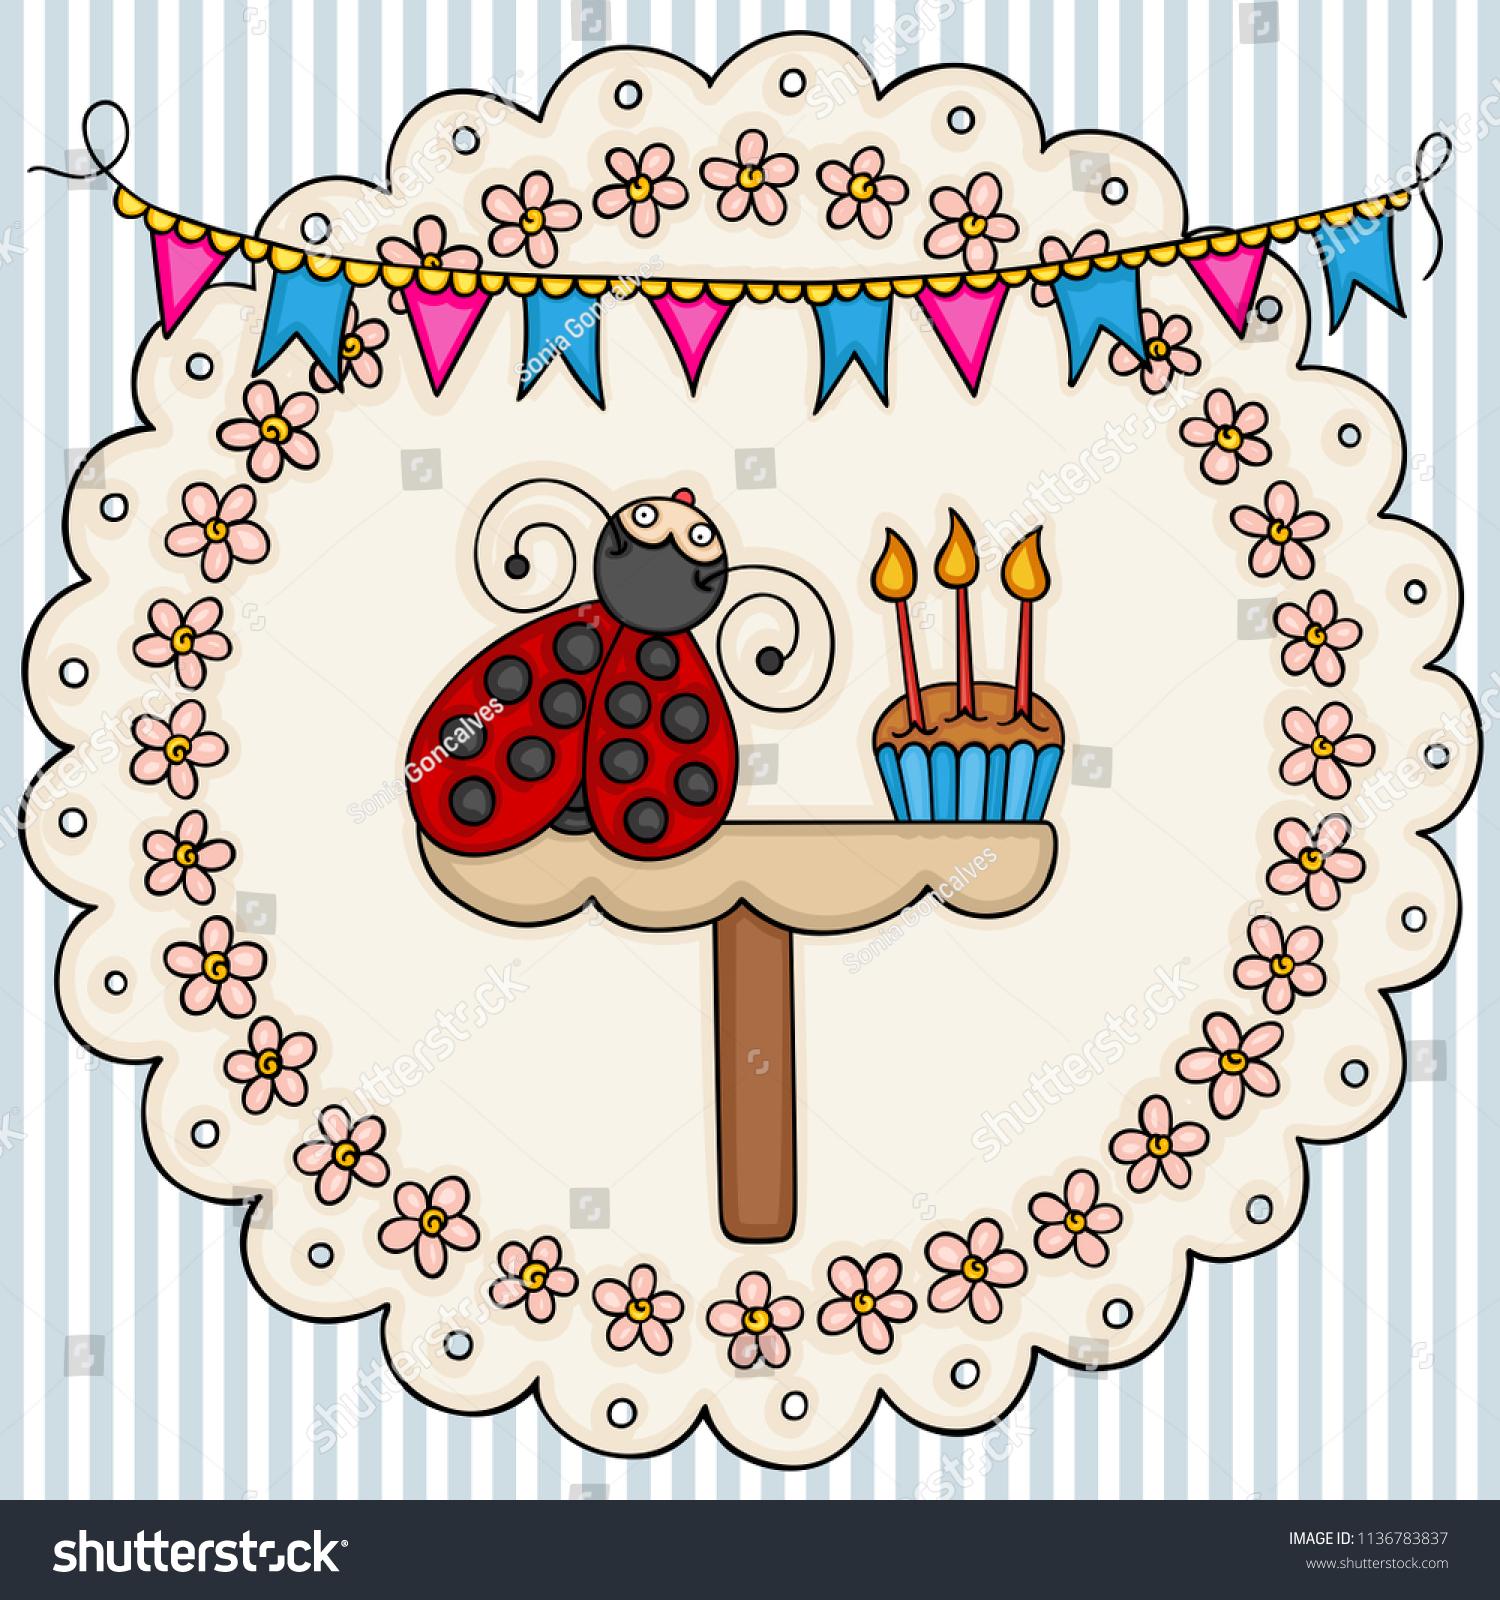 Card Template Cute Ladybug Birthday Cake Stock Vector 1136783837 ...